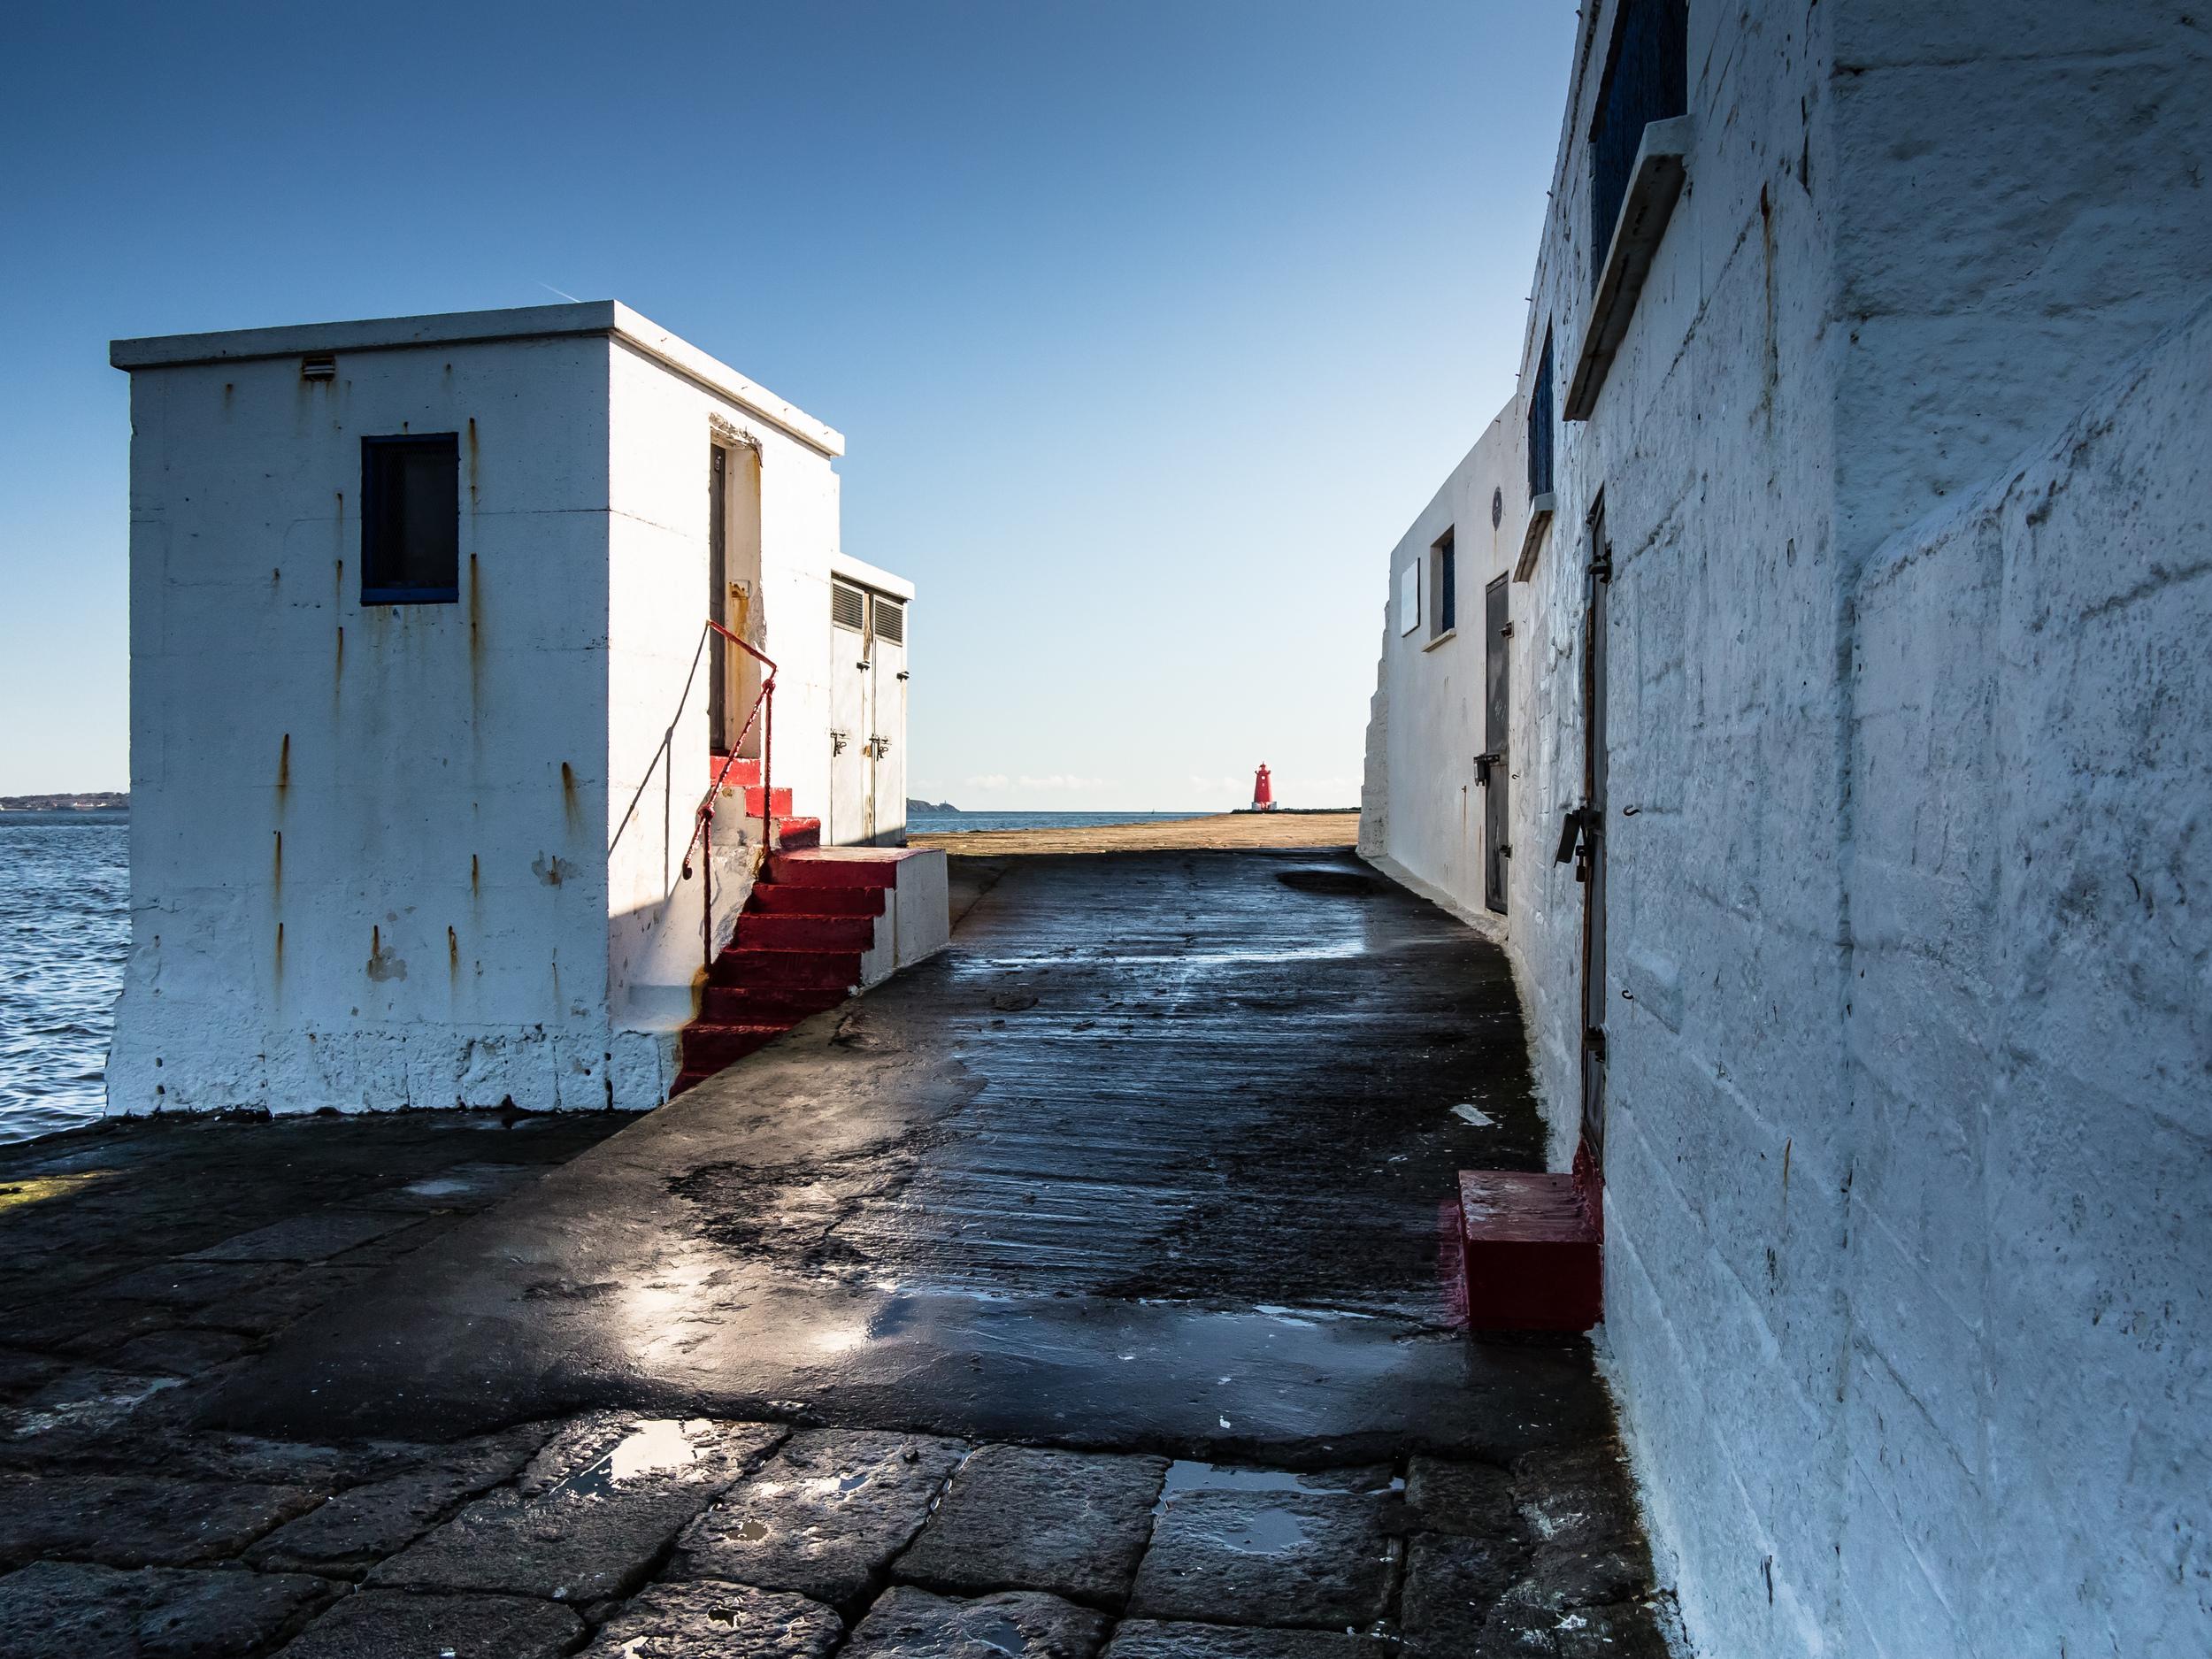 South Dock pier